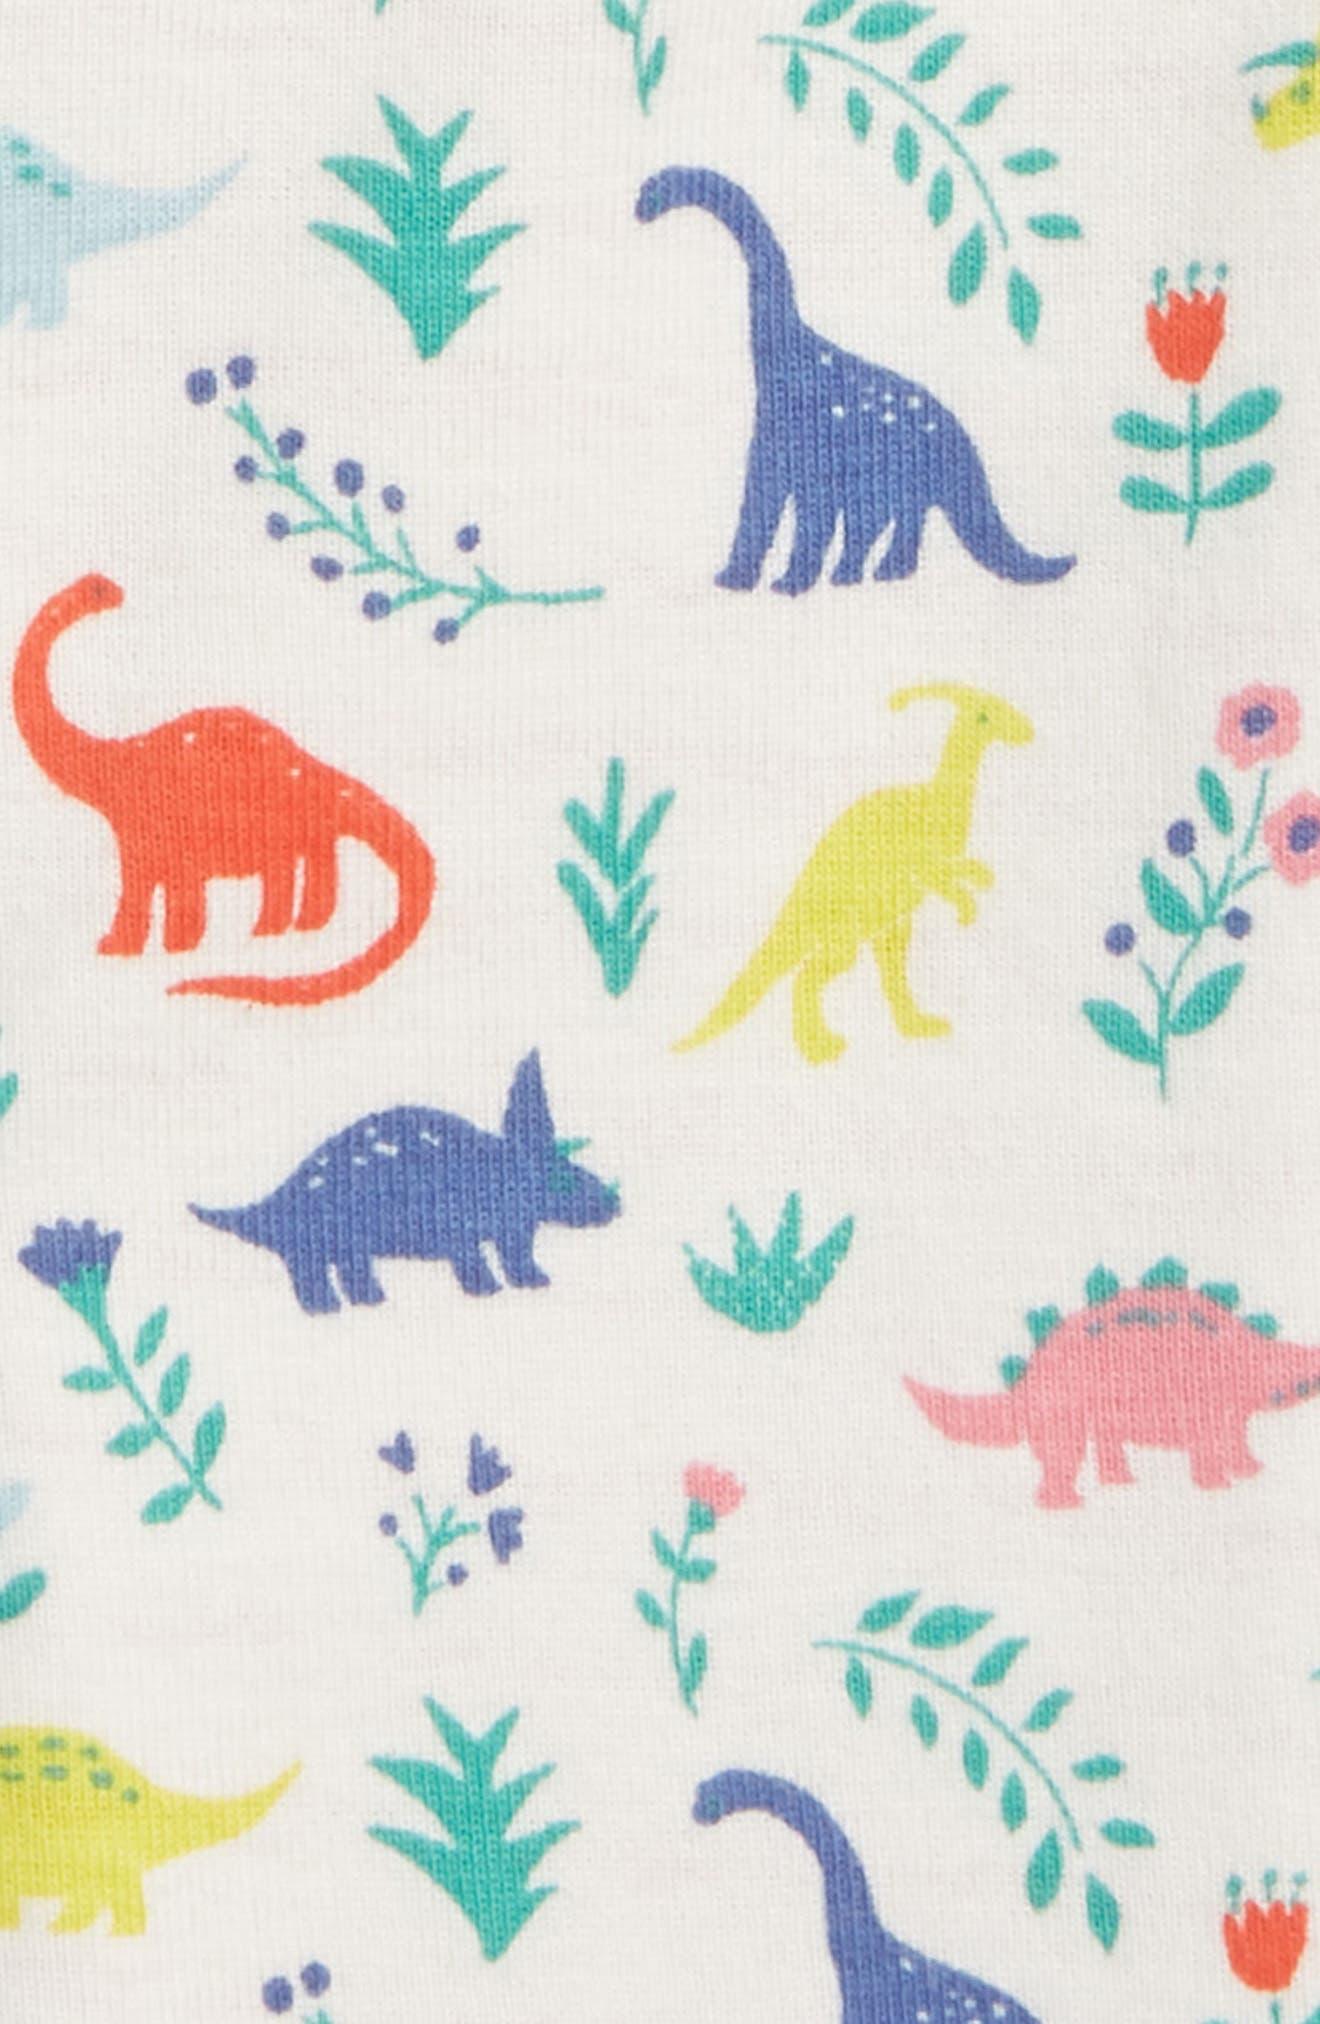 Reversible Print Pants,                             Alternate thumbnail 3, color,                             Multi Dino Floral